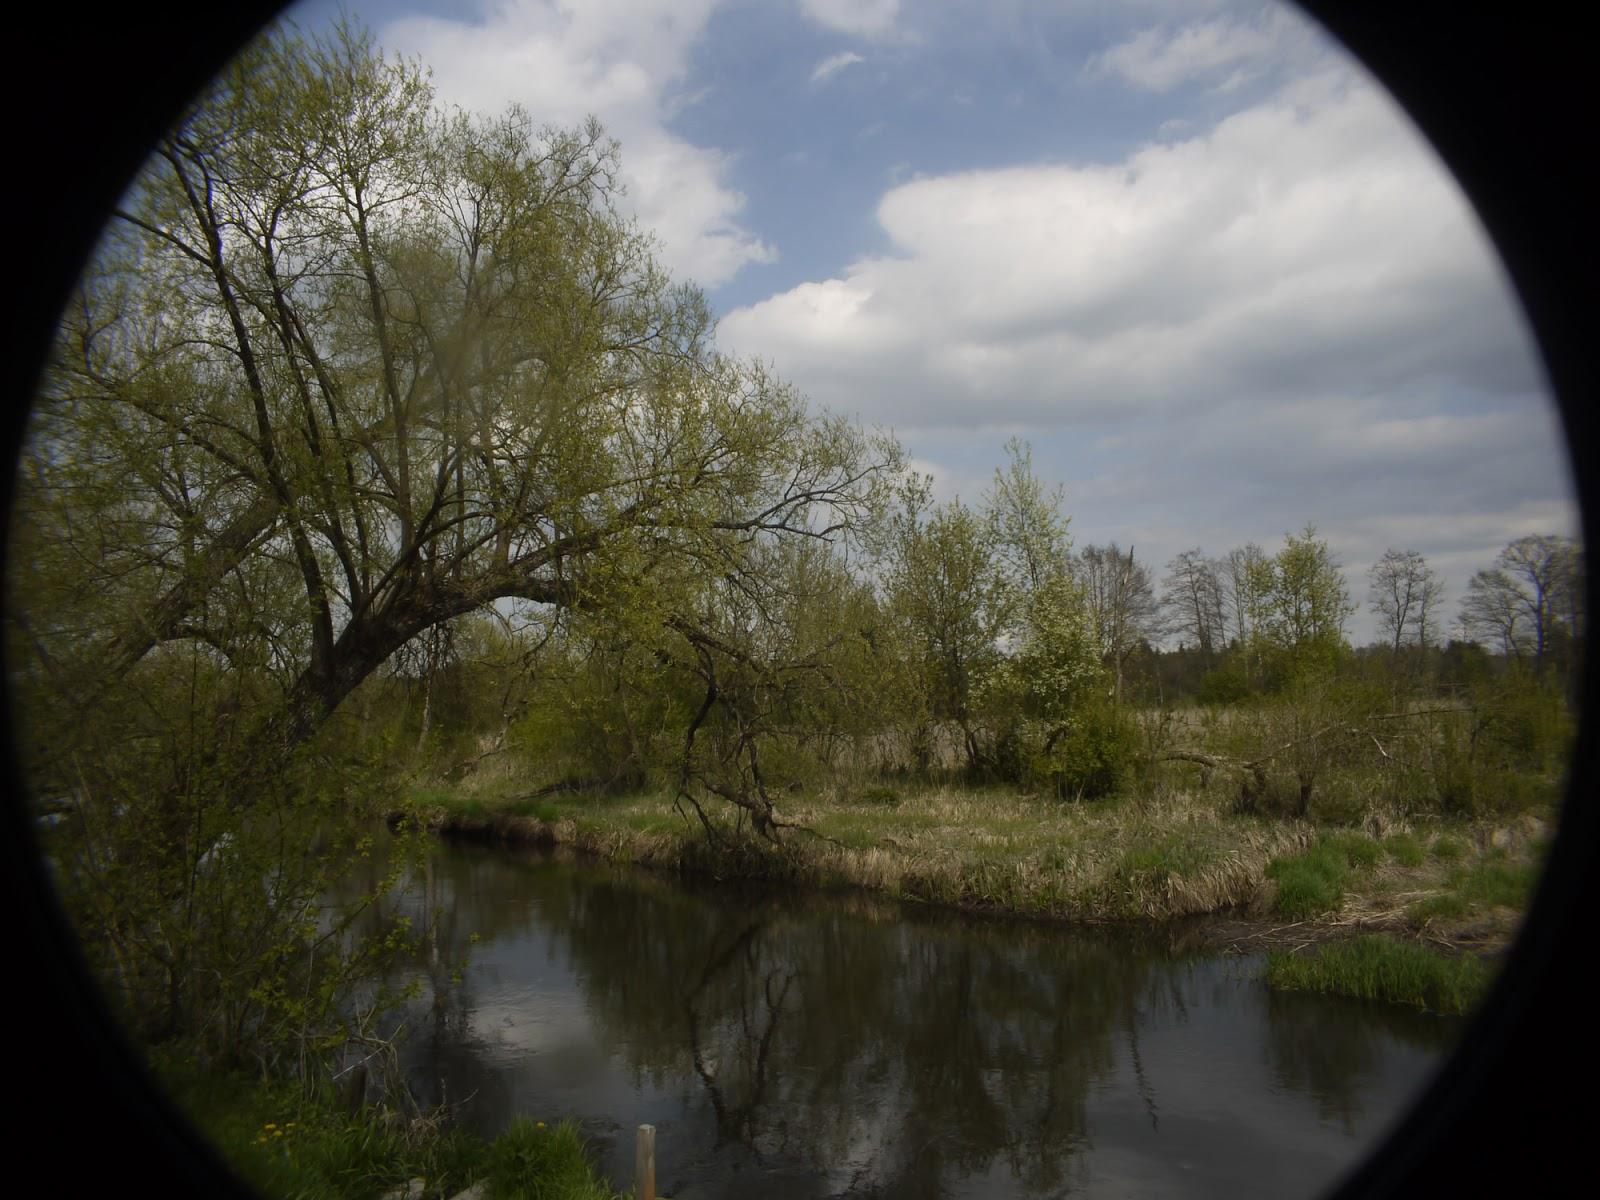 Cosmicar 12.5/1.9 @22 - landscape (full Micro Four Thirds sensor).